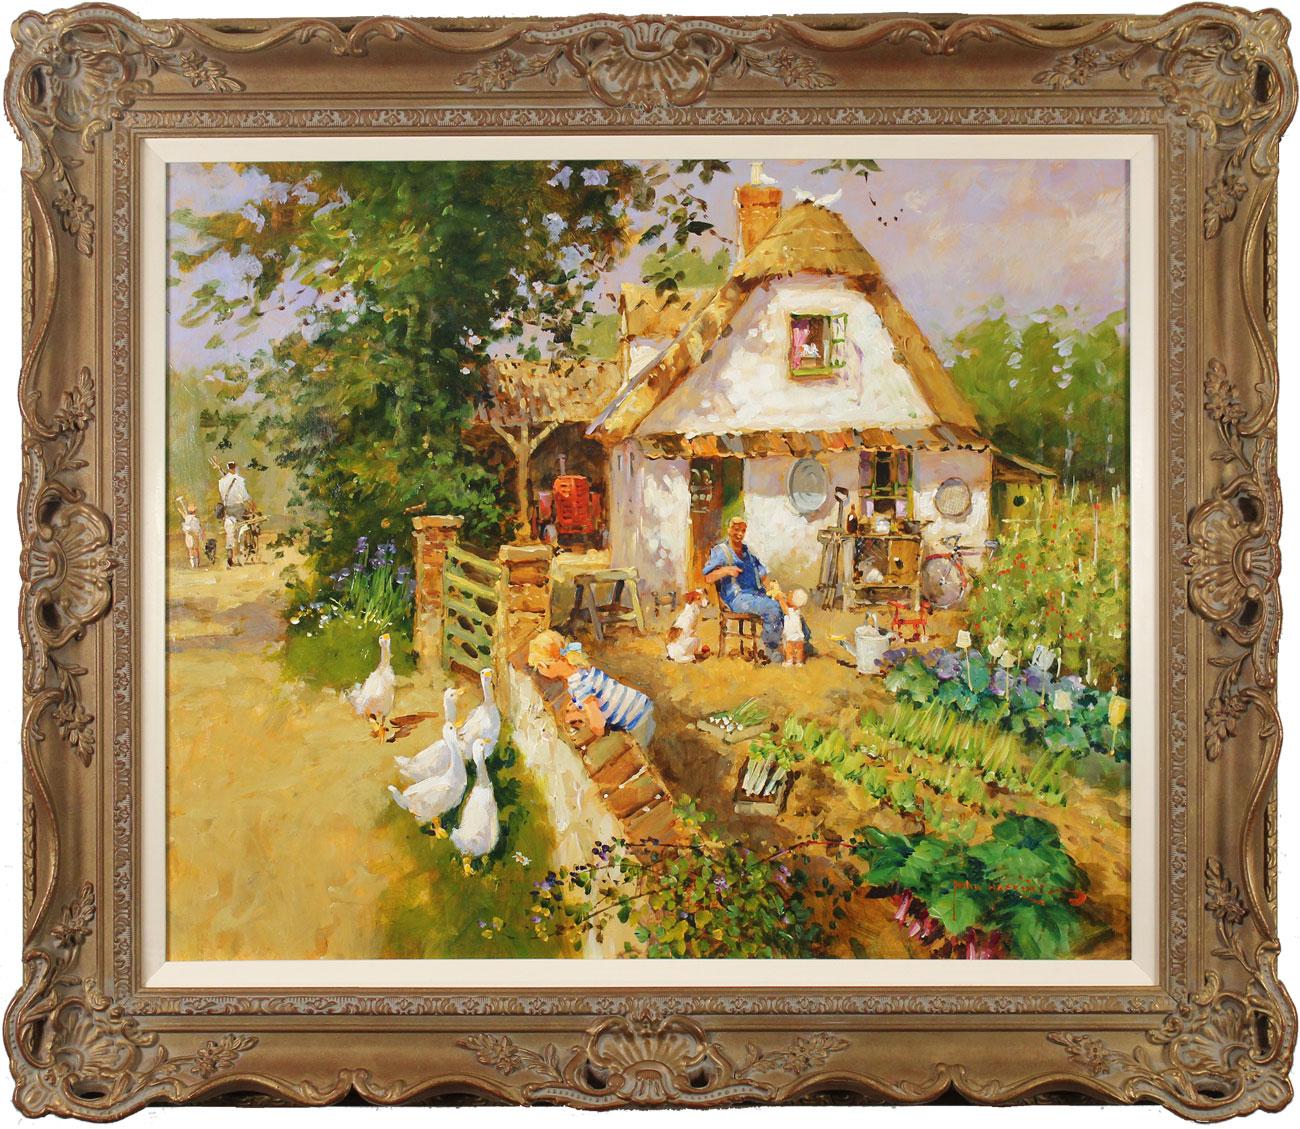 John Haskins, Original oil painting on panel, Walnut Cottage. Click to enlarge